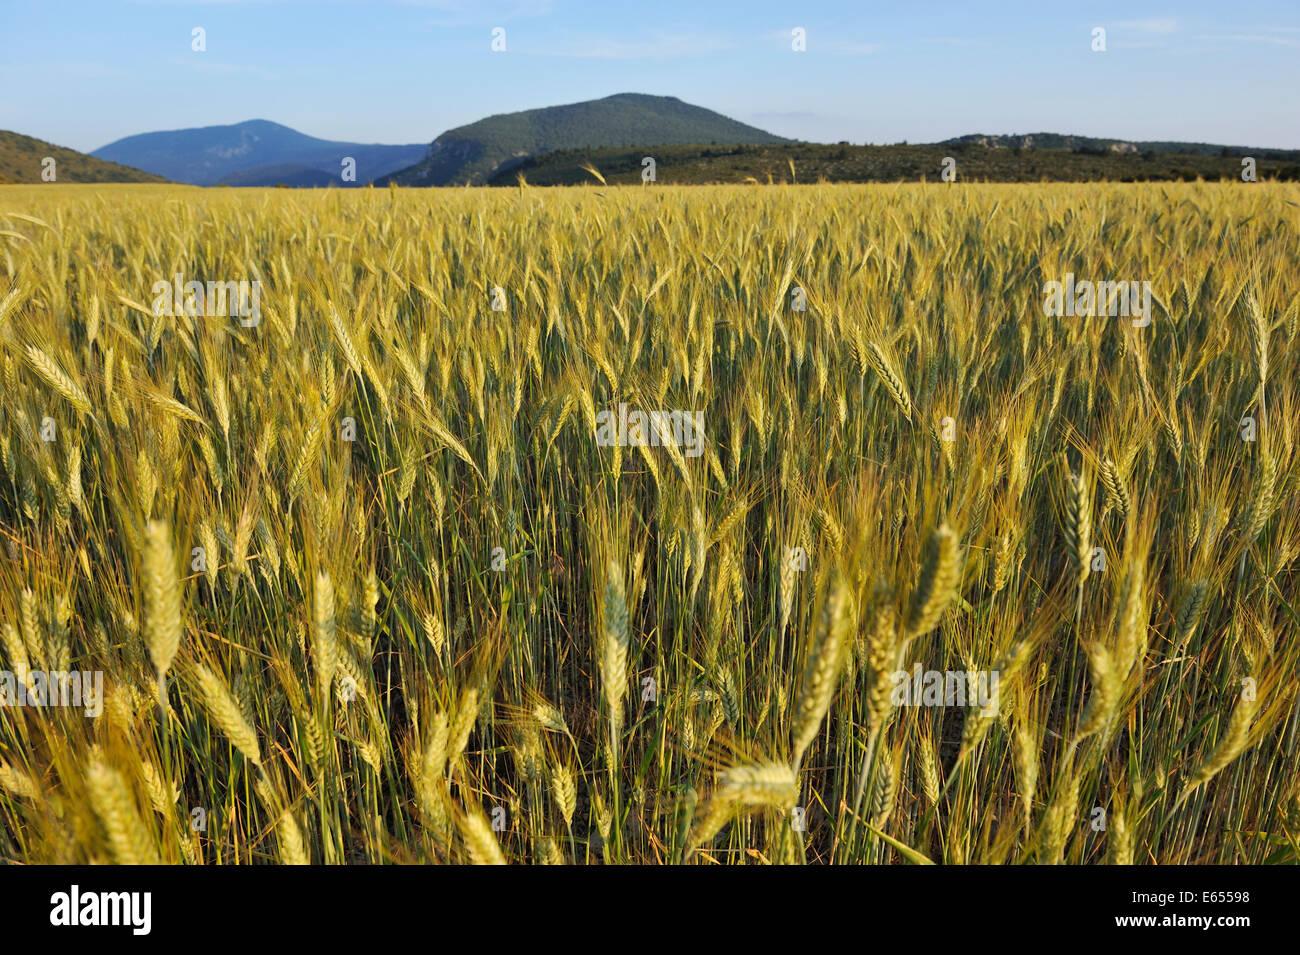 Wheat field, Gorges du Verdon, Provence, France, Europe - Stock Image